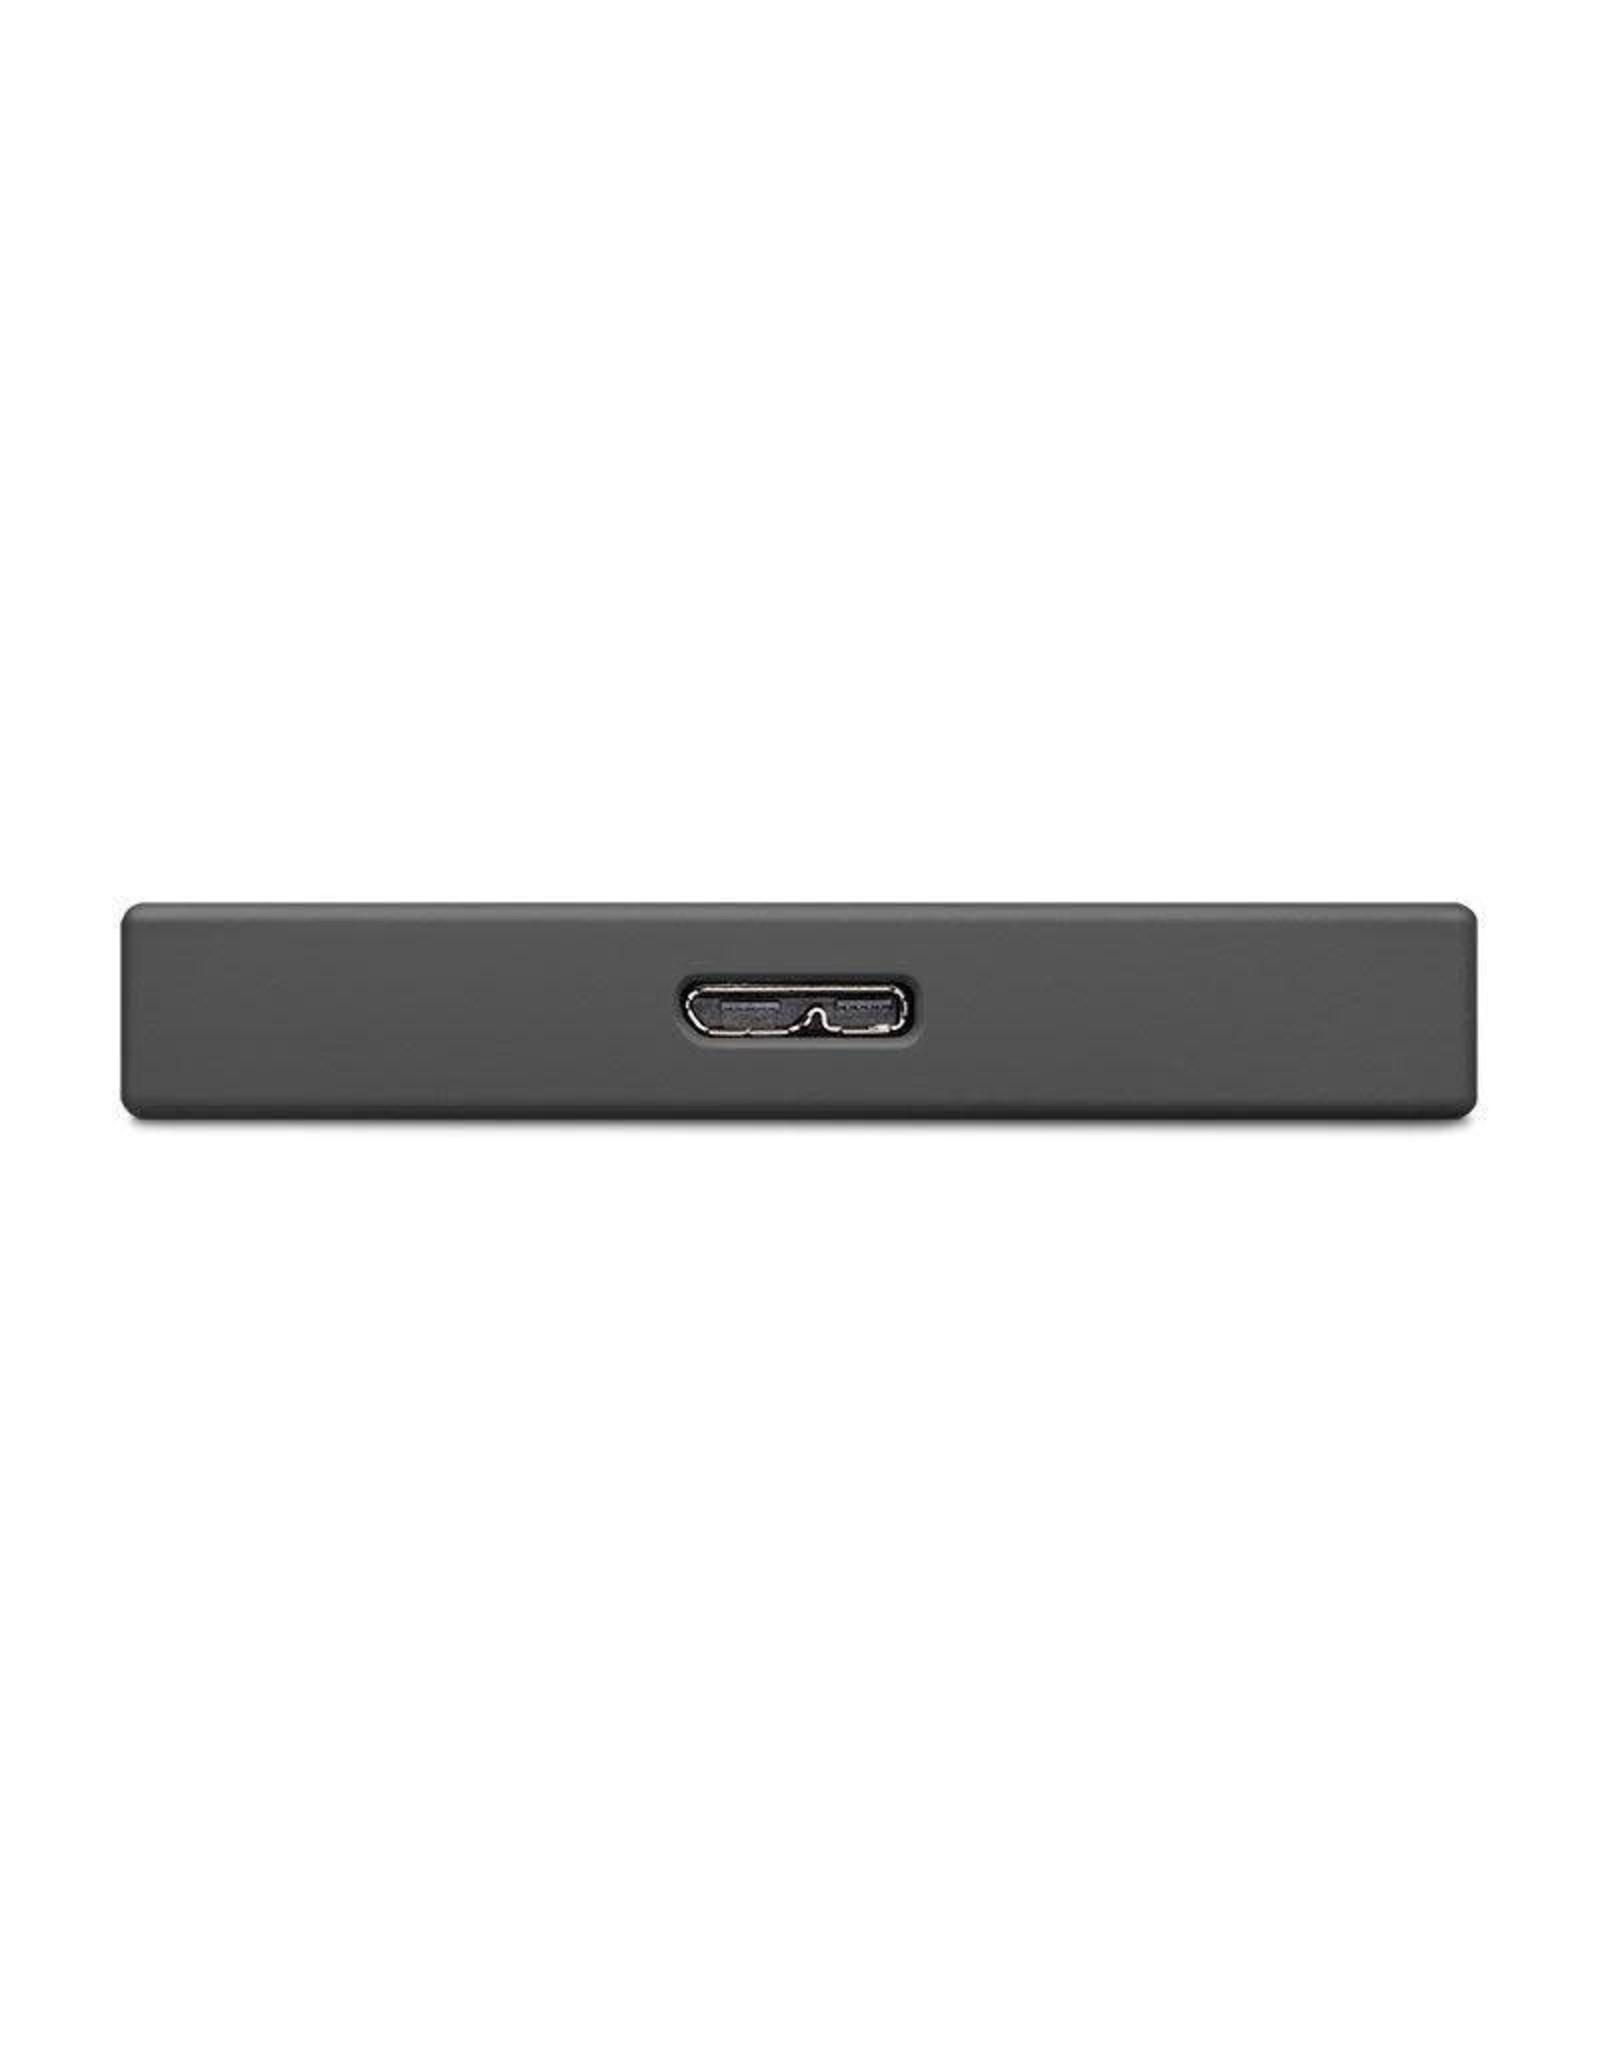 "Lacie LaCie 4TB Portable 2.5"" USB3.0 Drive"